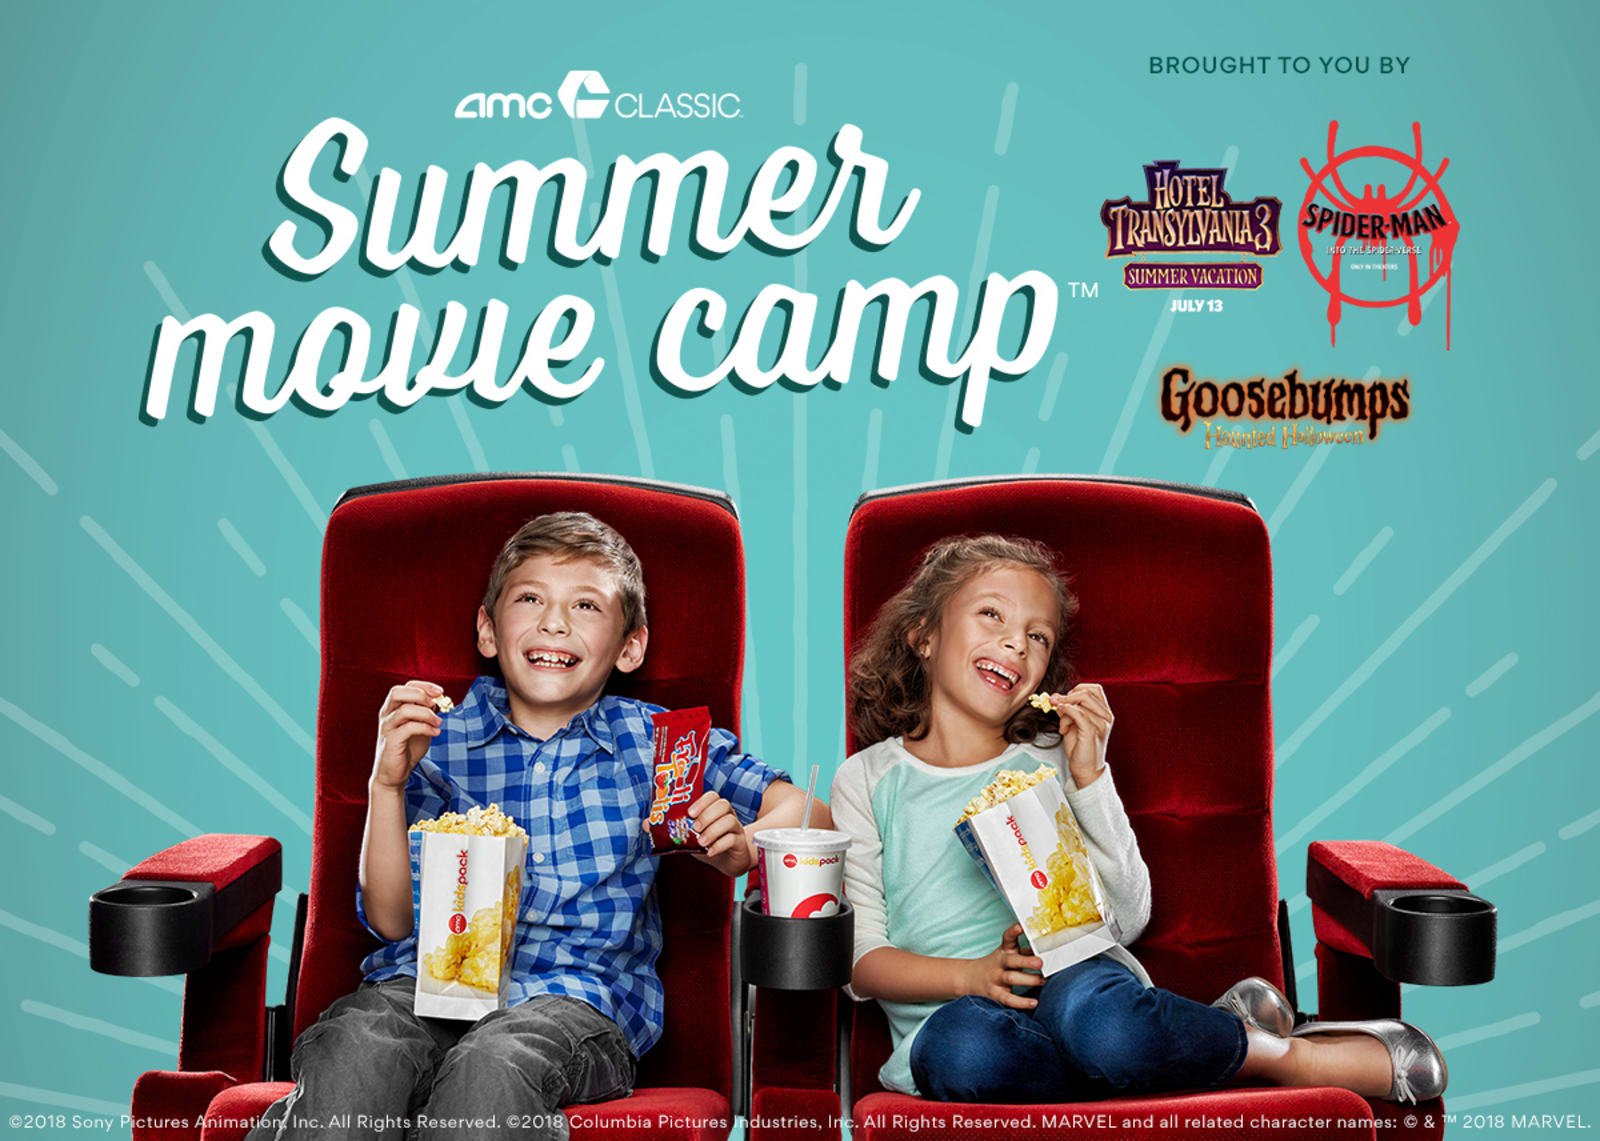 Amc Dutch Square 14 Showtimes Movie Tickets >> Amc Classic Dutch Square 14 Columbia South Carolina 29210 Amc